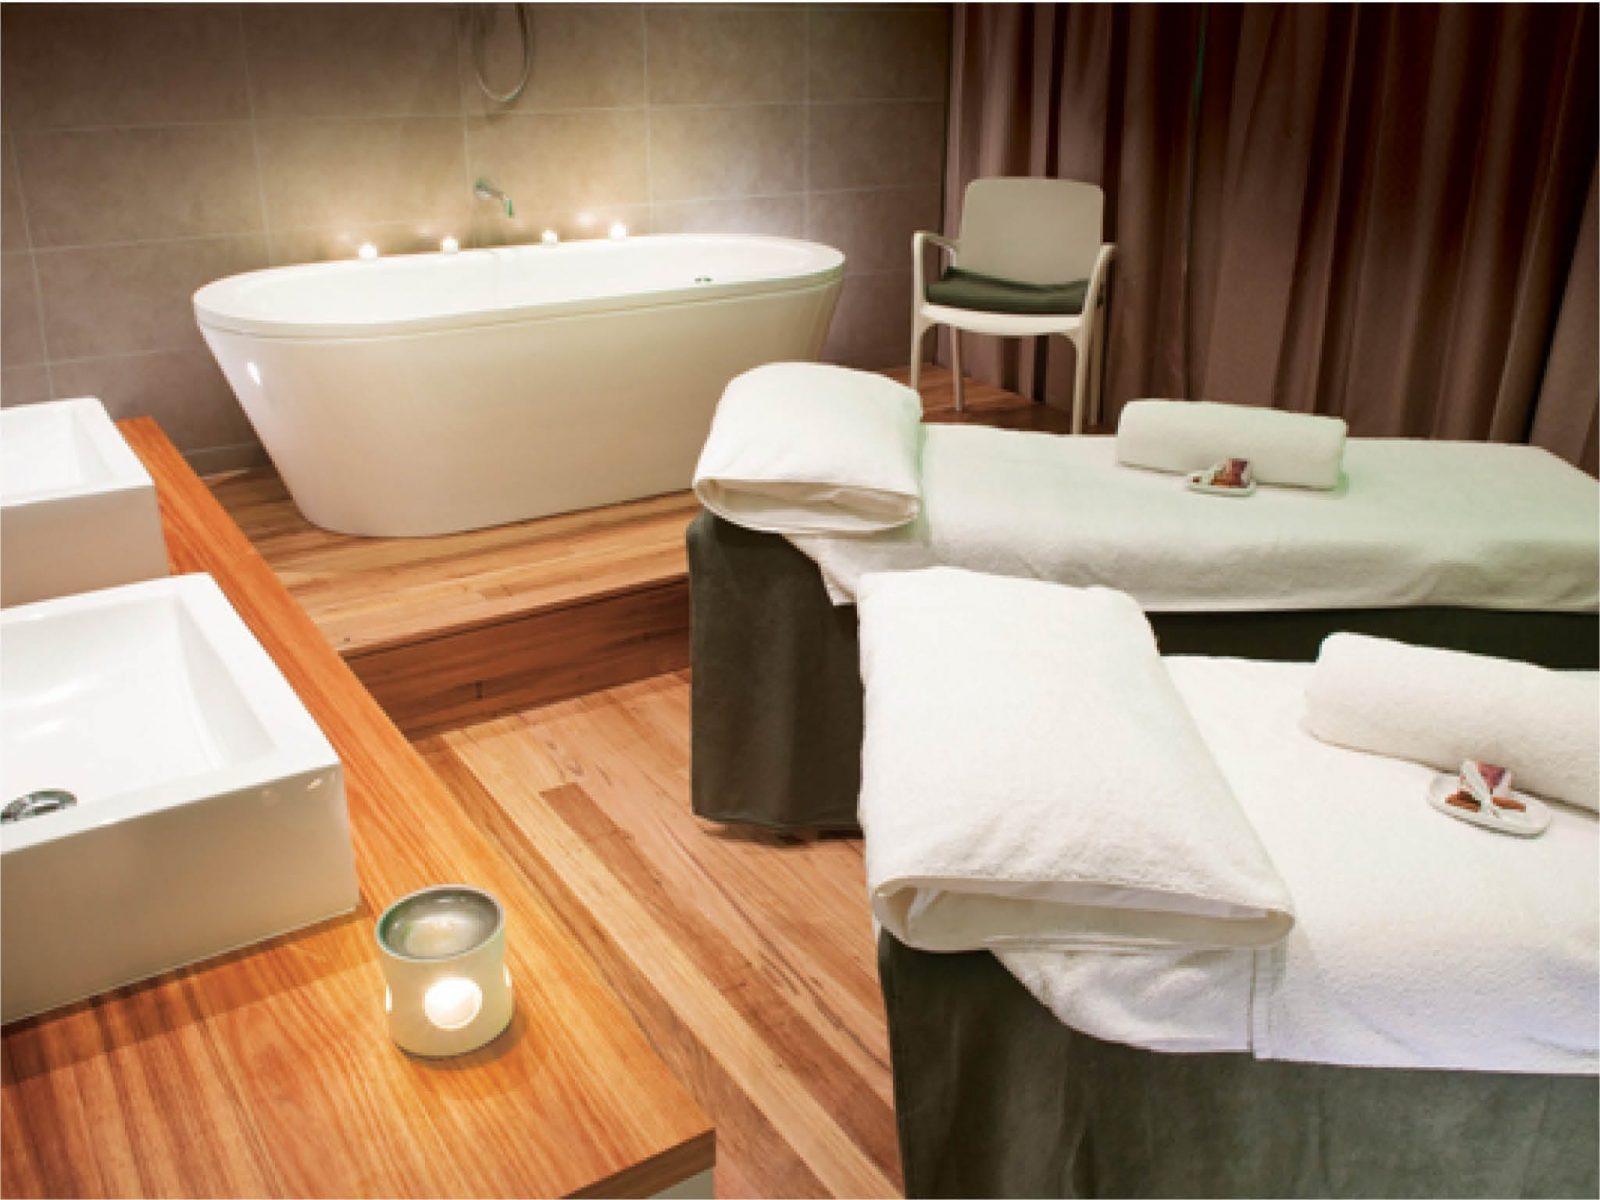 Treatment room double with bath